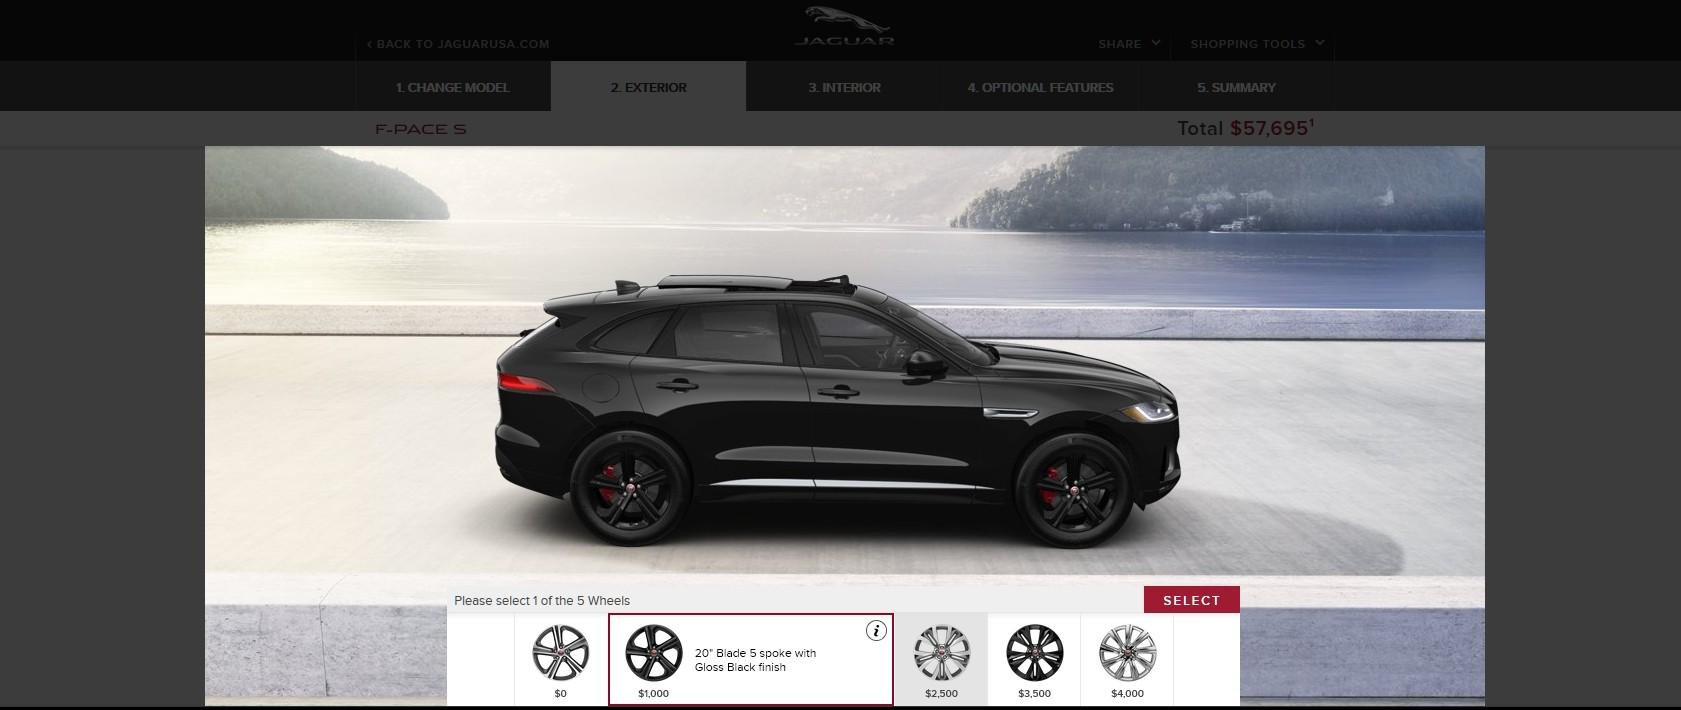 2017 jaguar f pace suv usa visualizer colros wheels 5 car revs. Black Bedroom Furniture Sets. Home Design Ideas